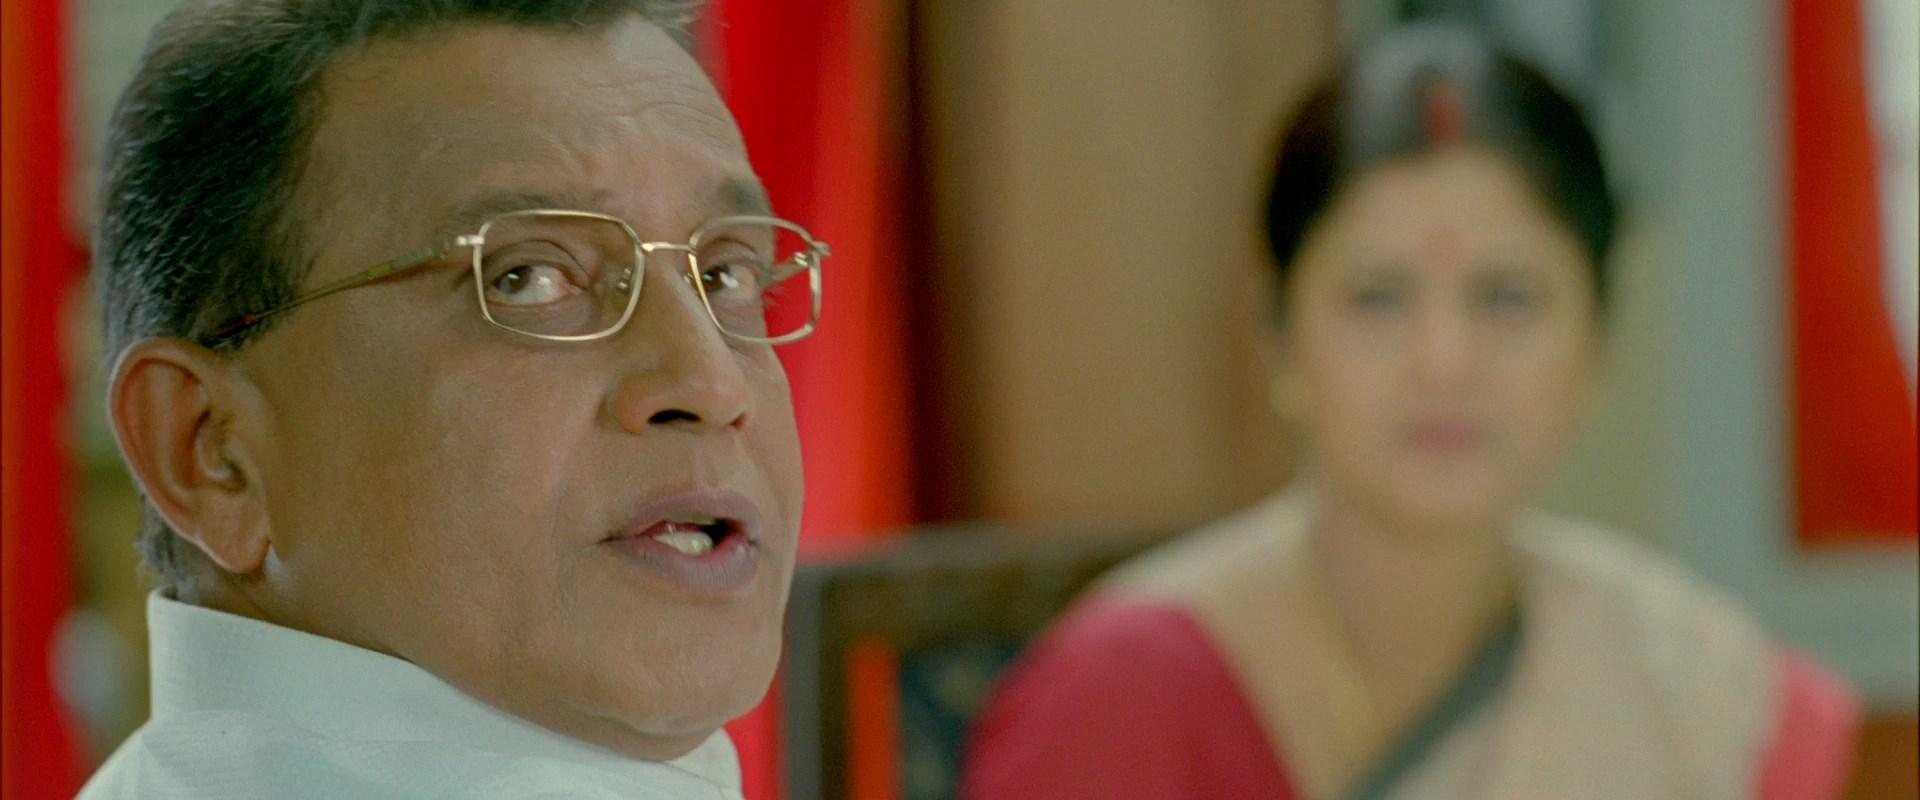 Ami Shubhash Bolchi.2020.Bangali.1080p.WEB DL.H264.AAC.D0T.Telly.mkv snapshot 00.55.00.967